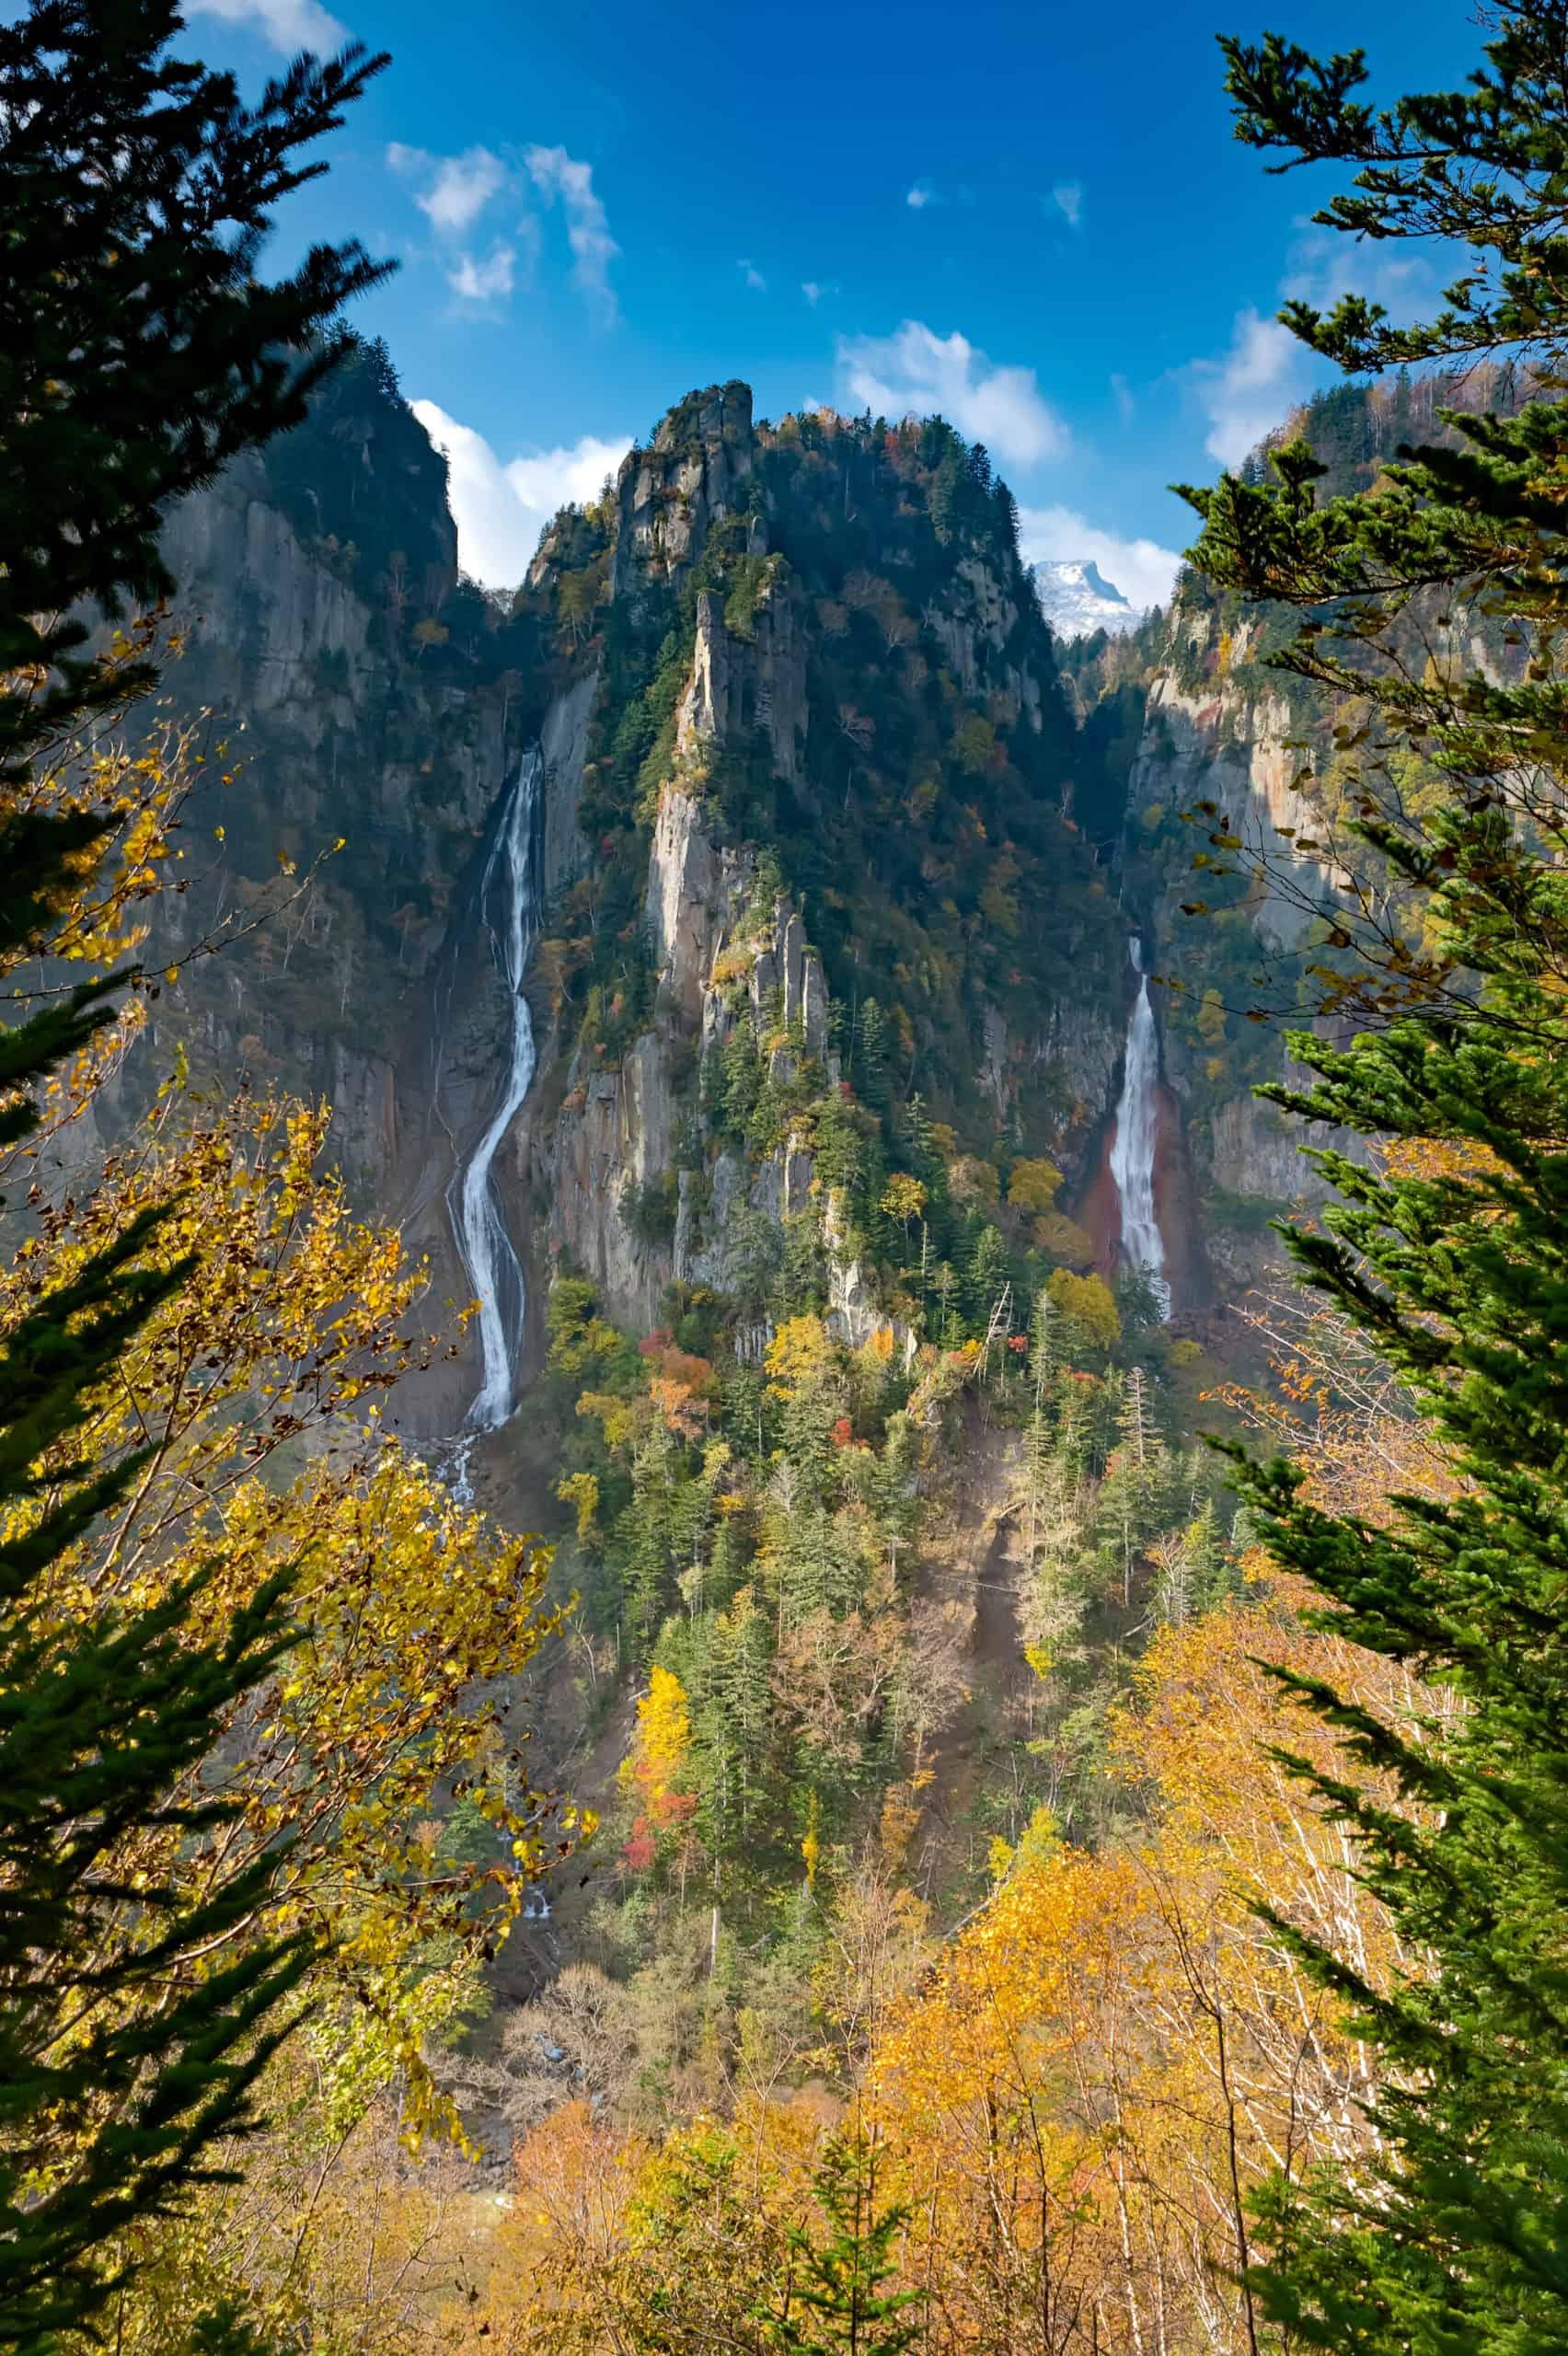 Ginga Waterfall - Best waterfalls in Japan